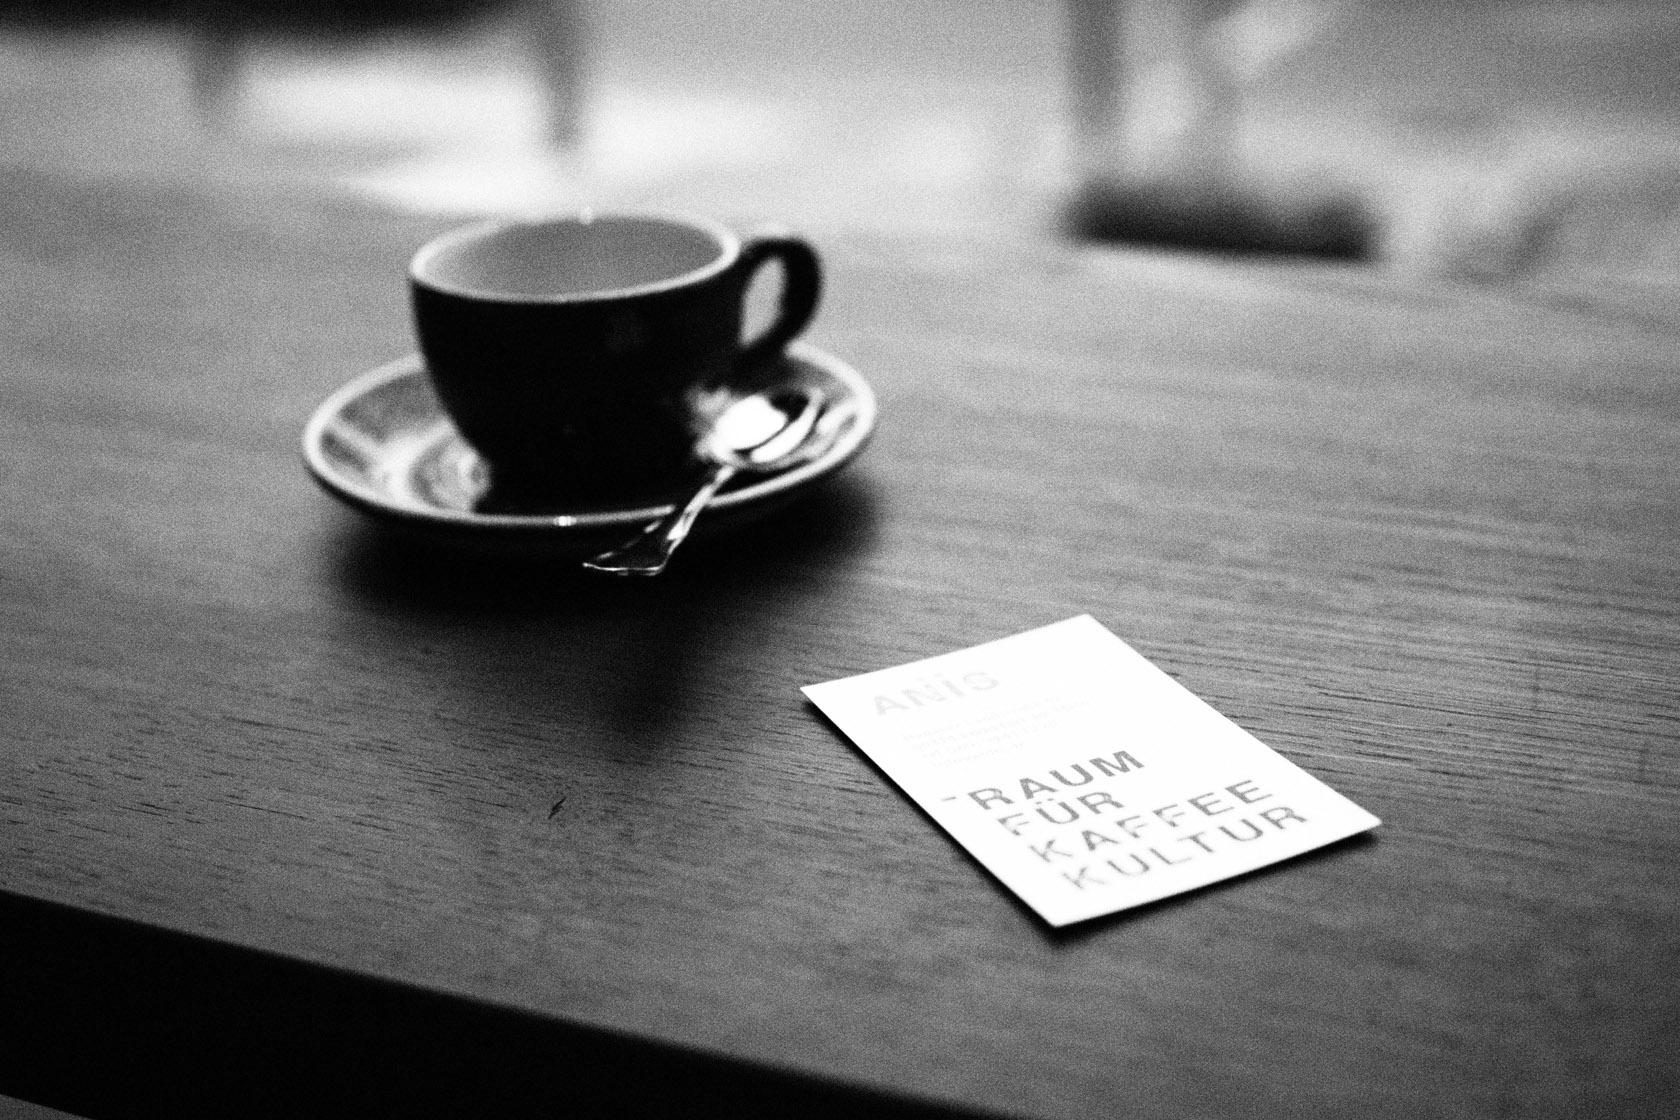 Kein Filterkaffee